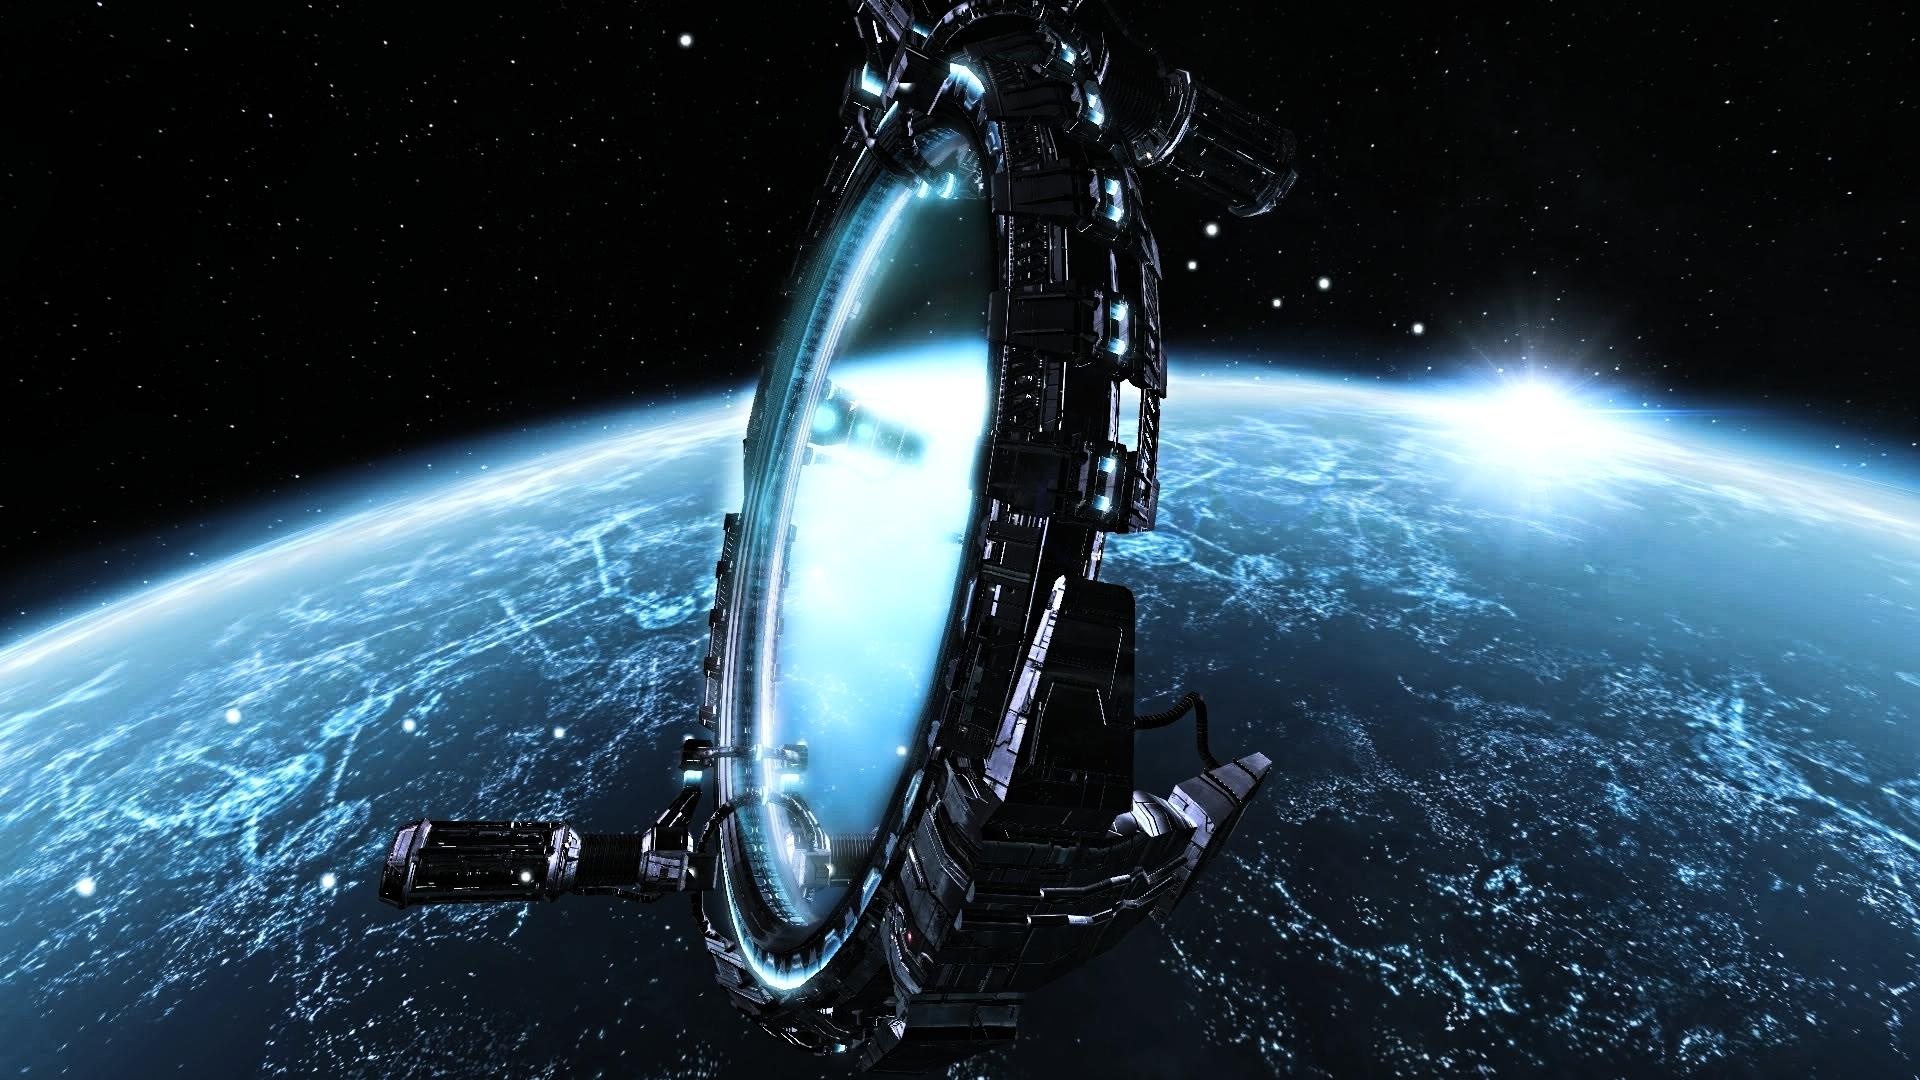 Stargate Sg 1 Hd Wallpaper Background Image 1920x1080